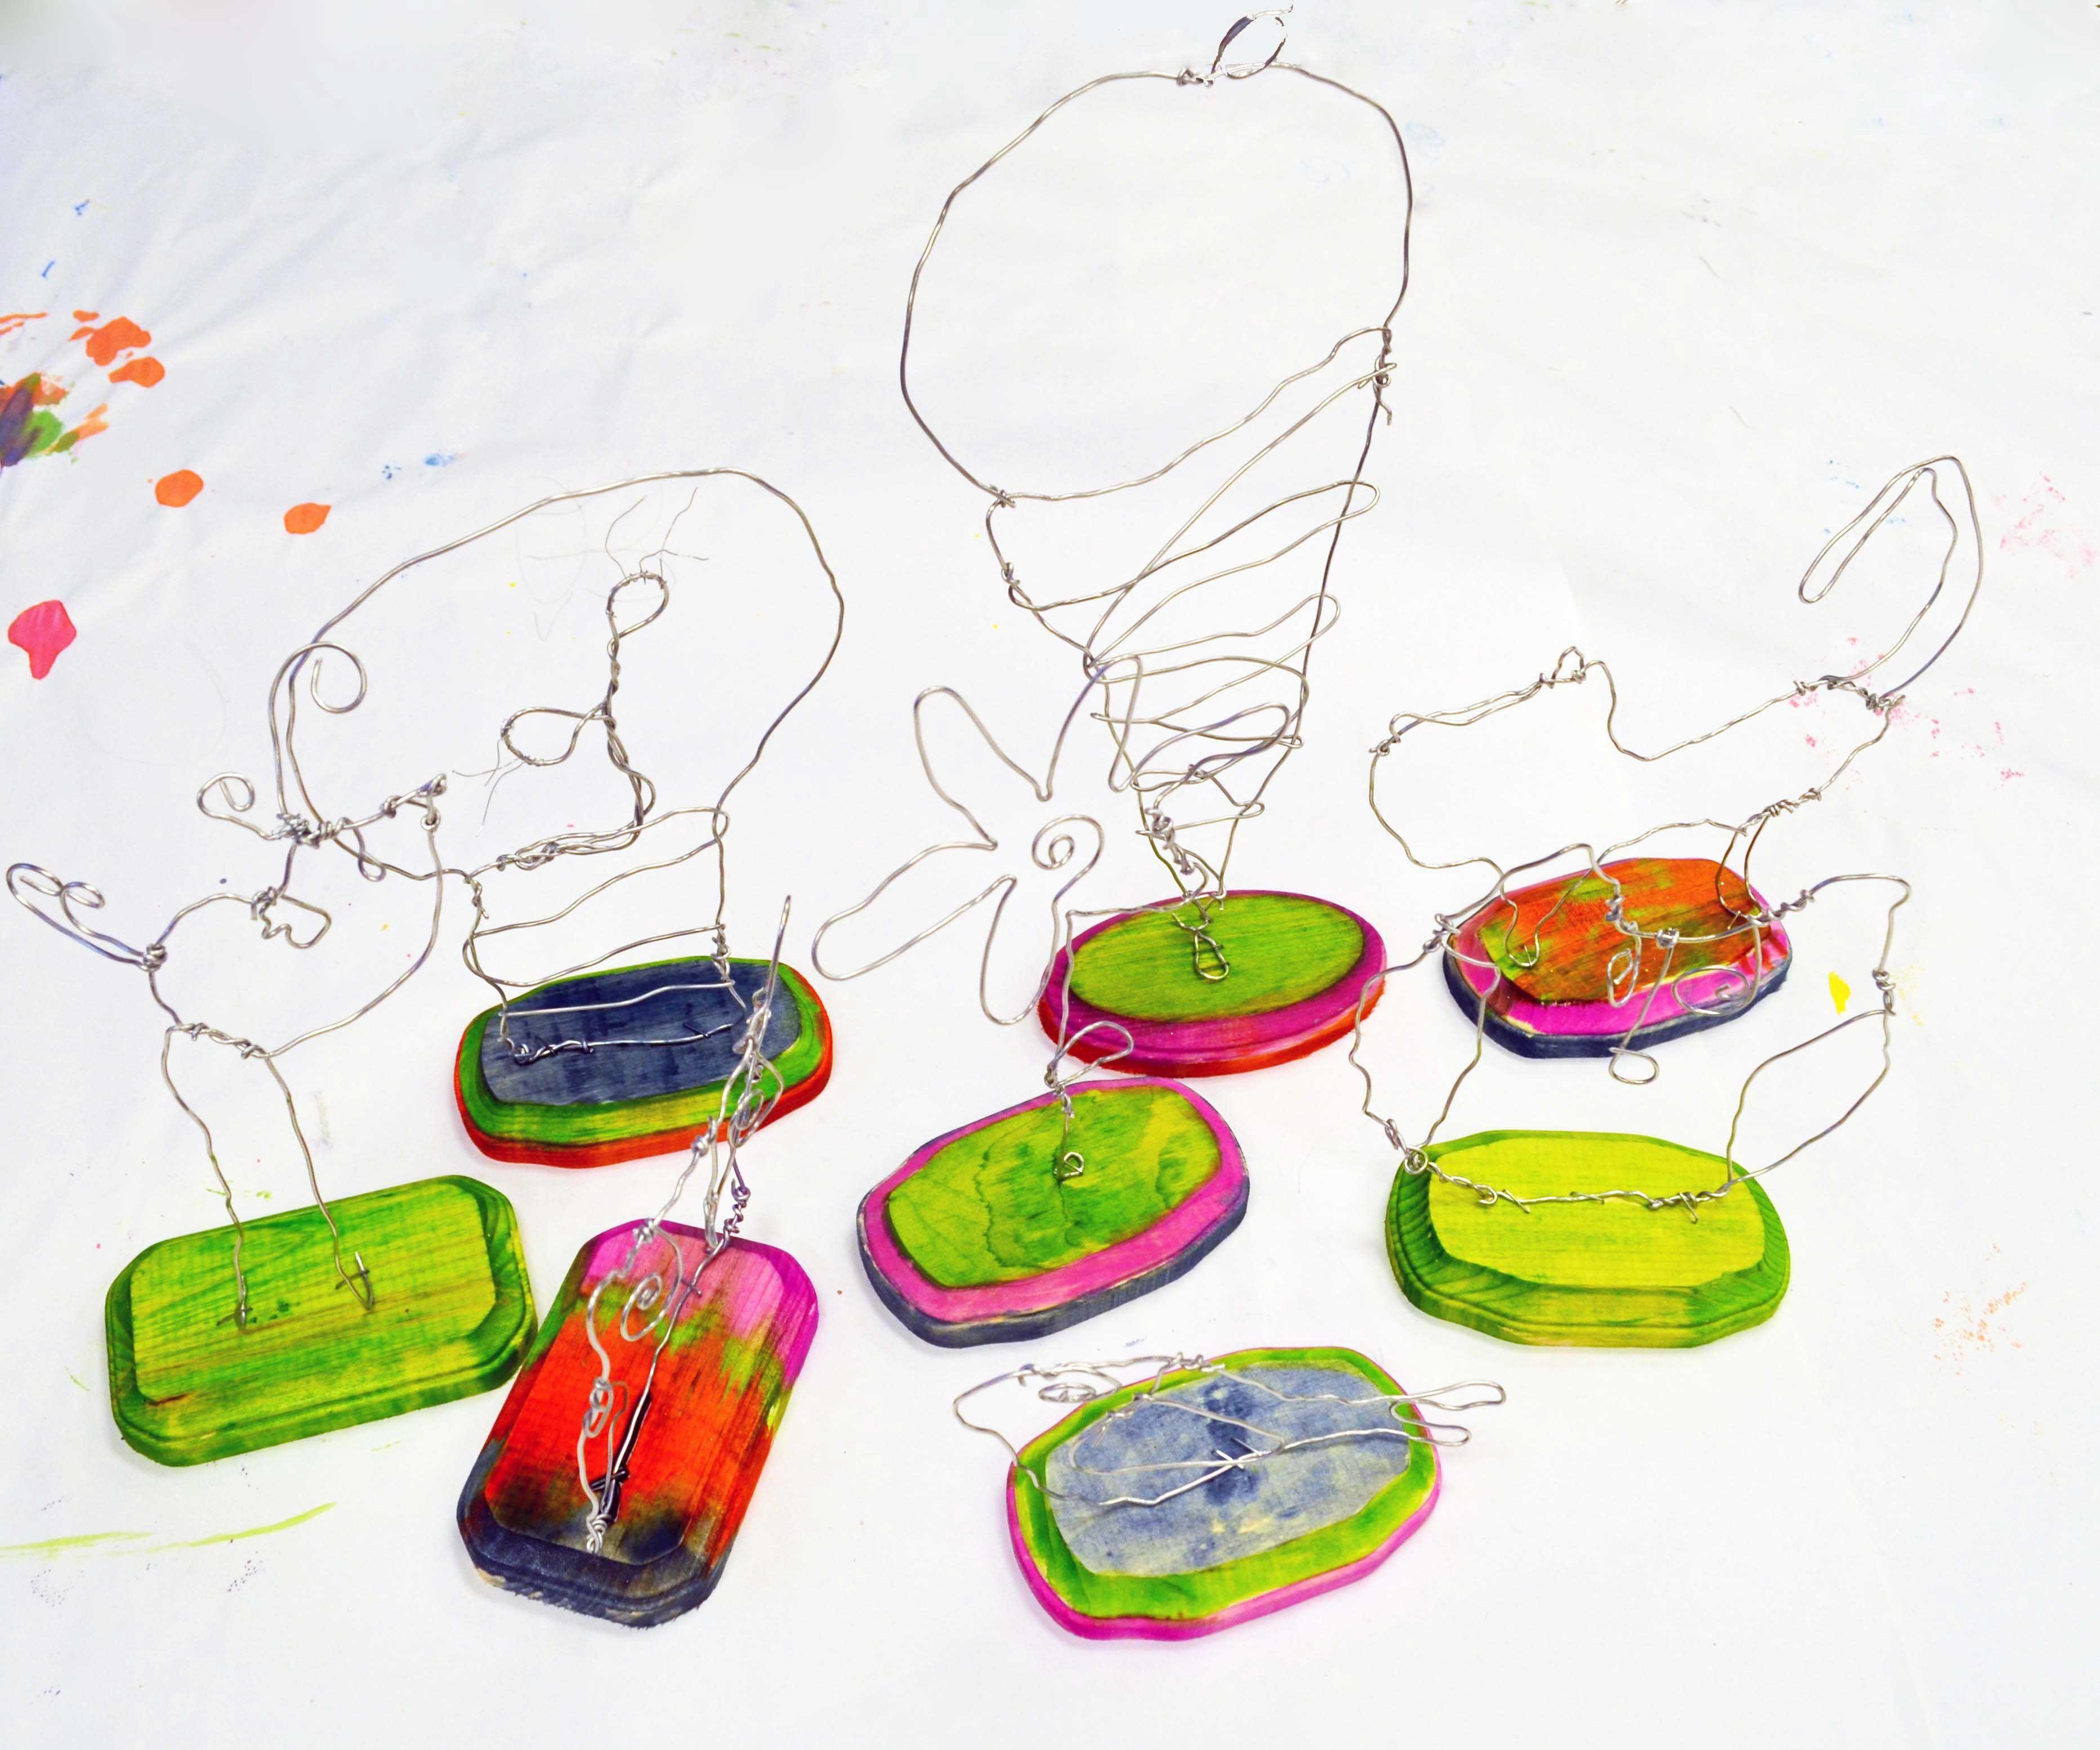 calder inspired wire sculptures 2nd 3rd art lesson plan